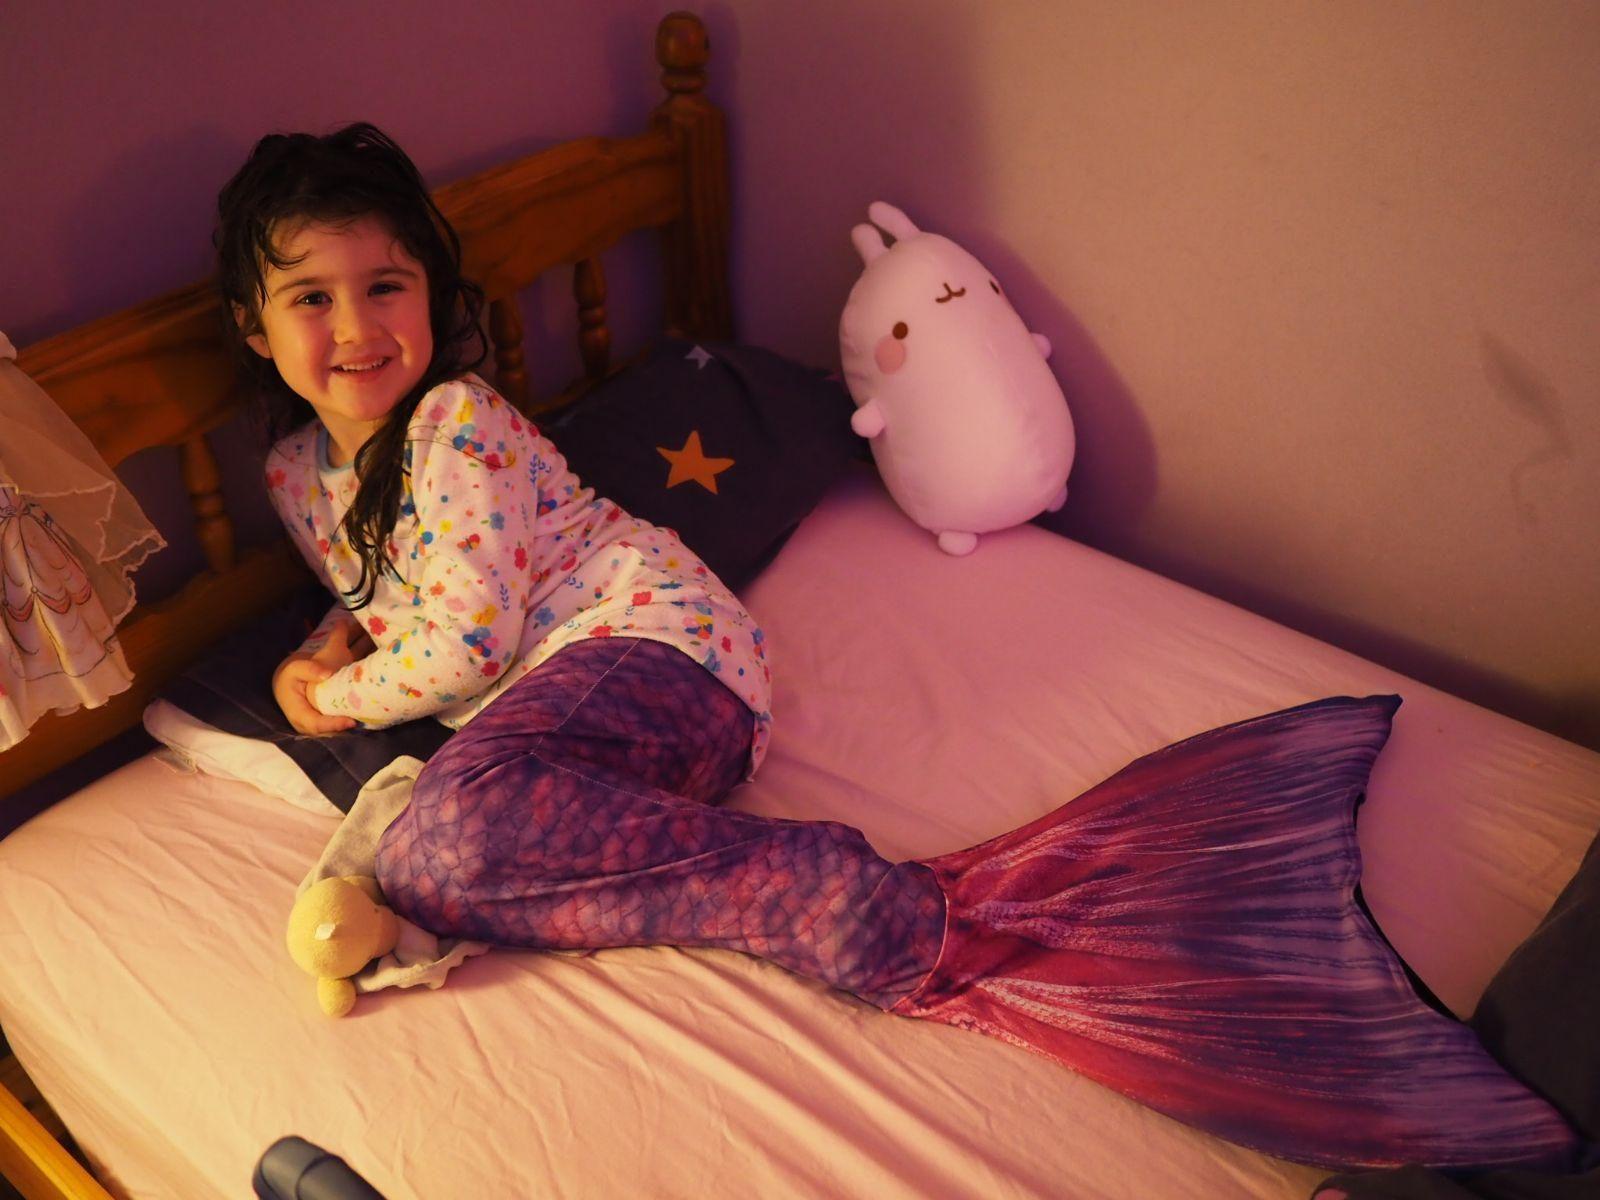 girl in purple planet mermaid tail in bed